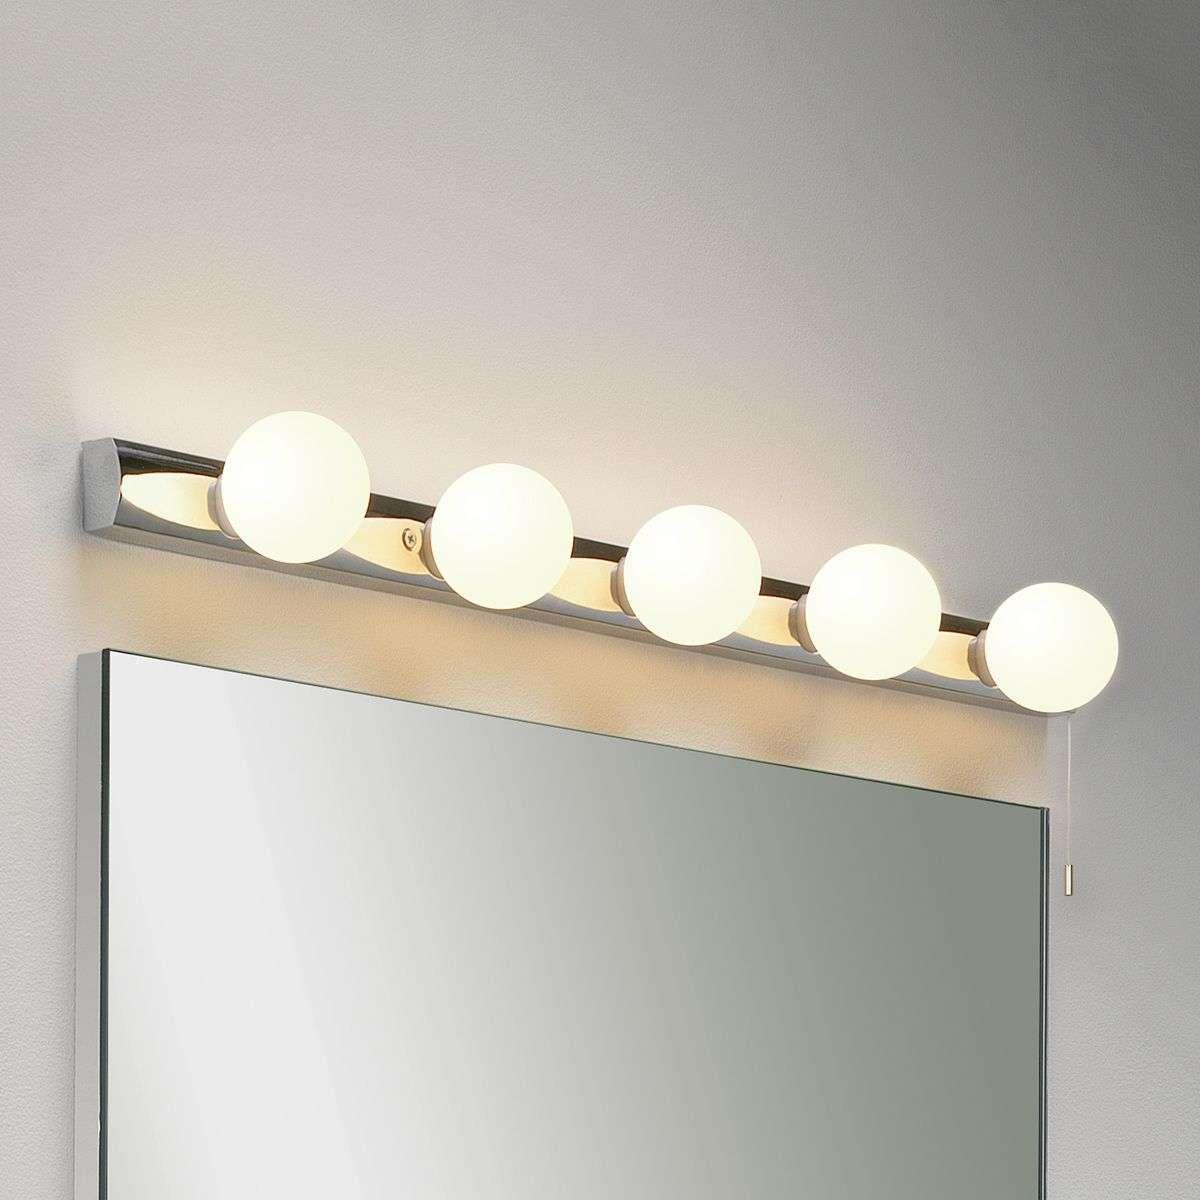 Cabaret 5 Mirror Wall Light Classic-1020371-31